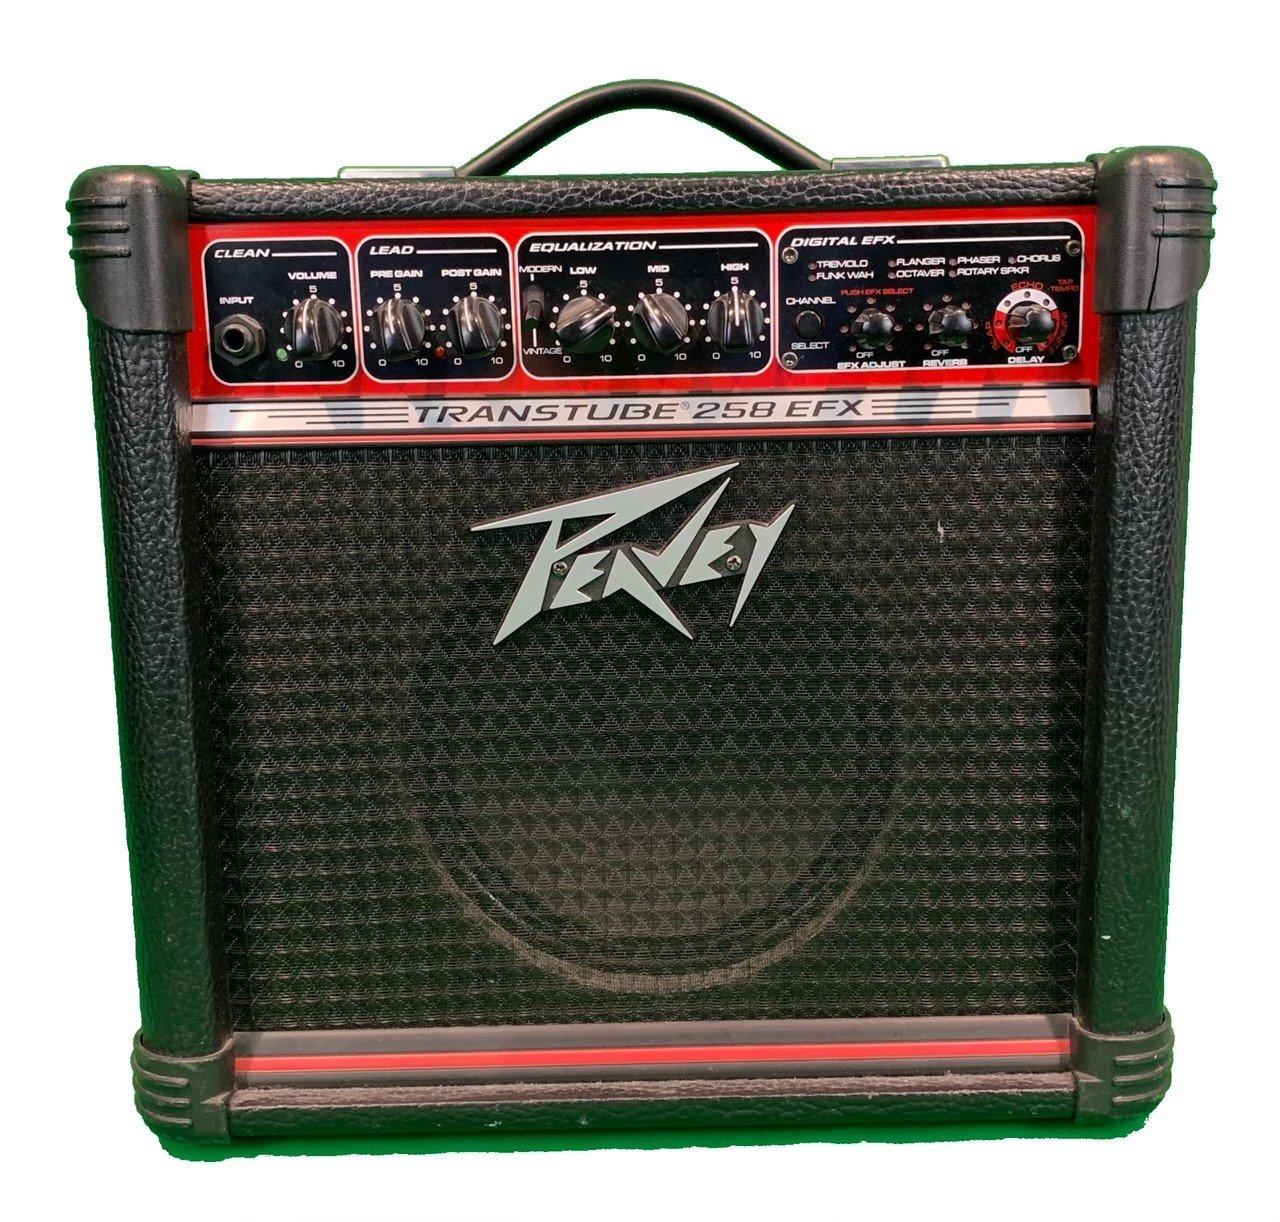 Used Peavey Transtube 258 EFX guitar Amplifier